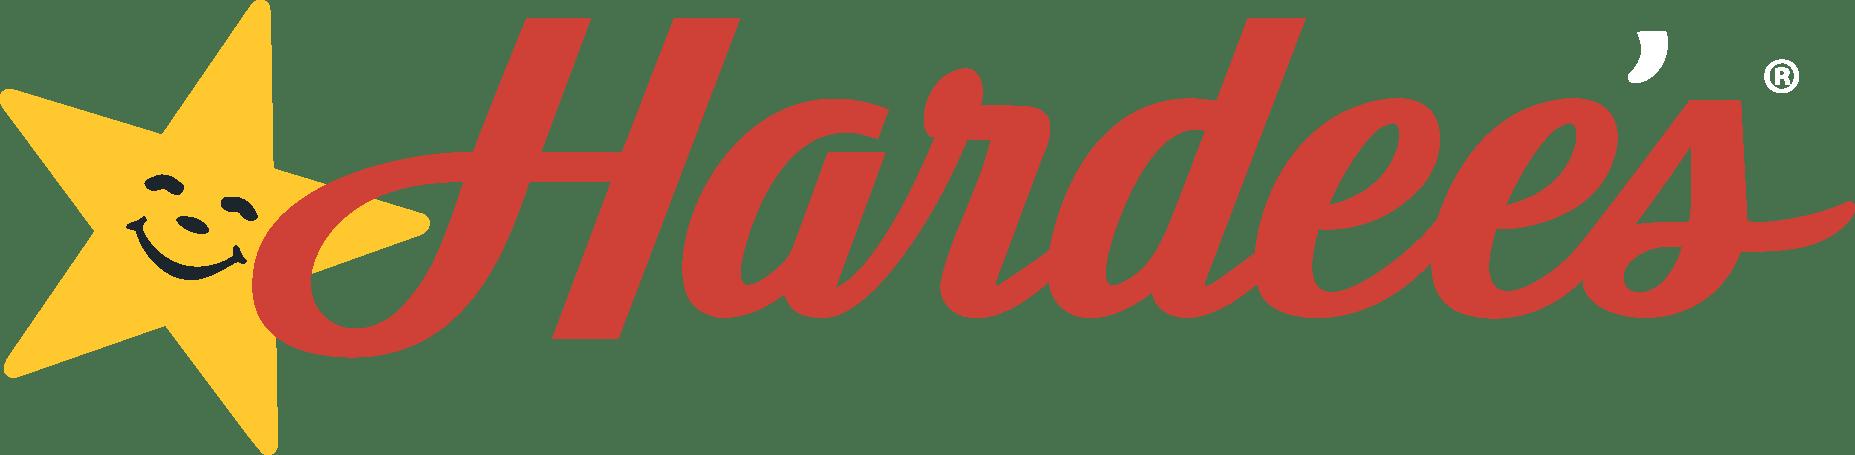 Hardees Logo Download Vector.